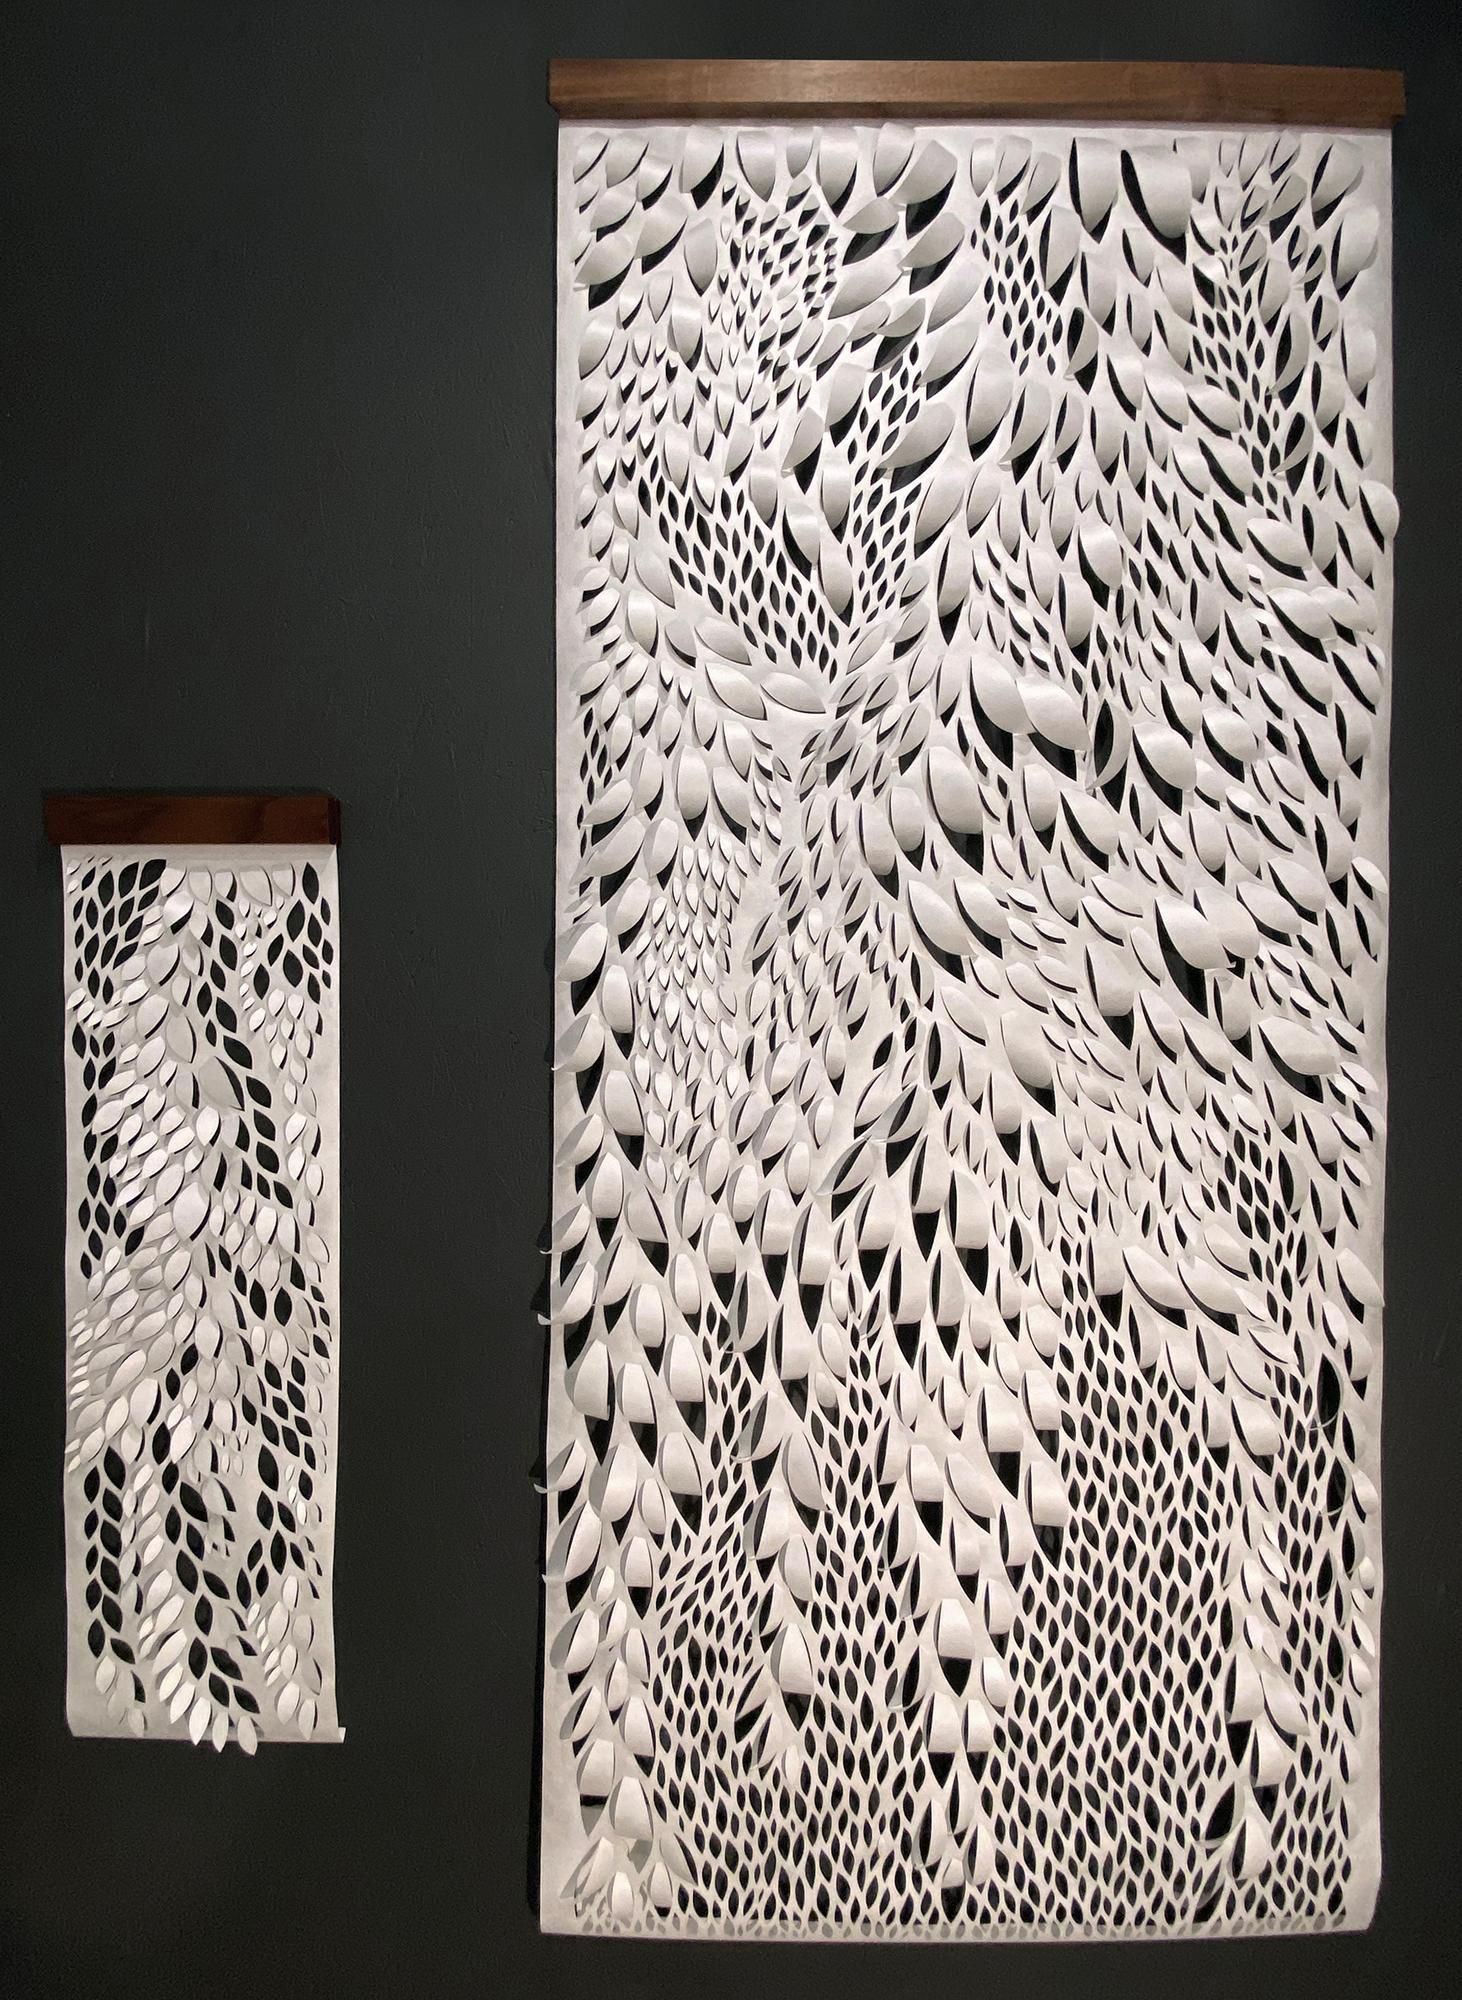 Hand-cut Paper Scroll, Wall Hangings 56x24